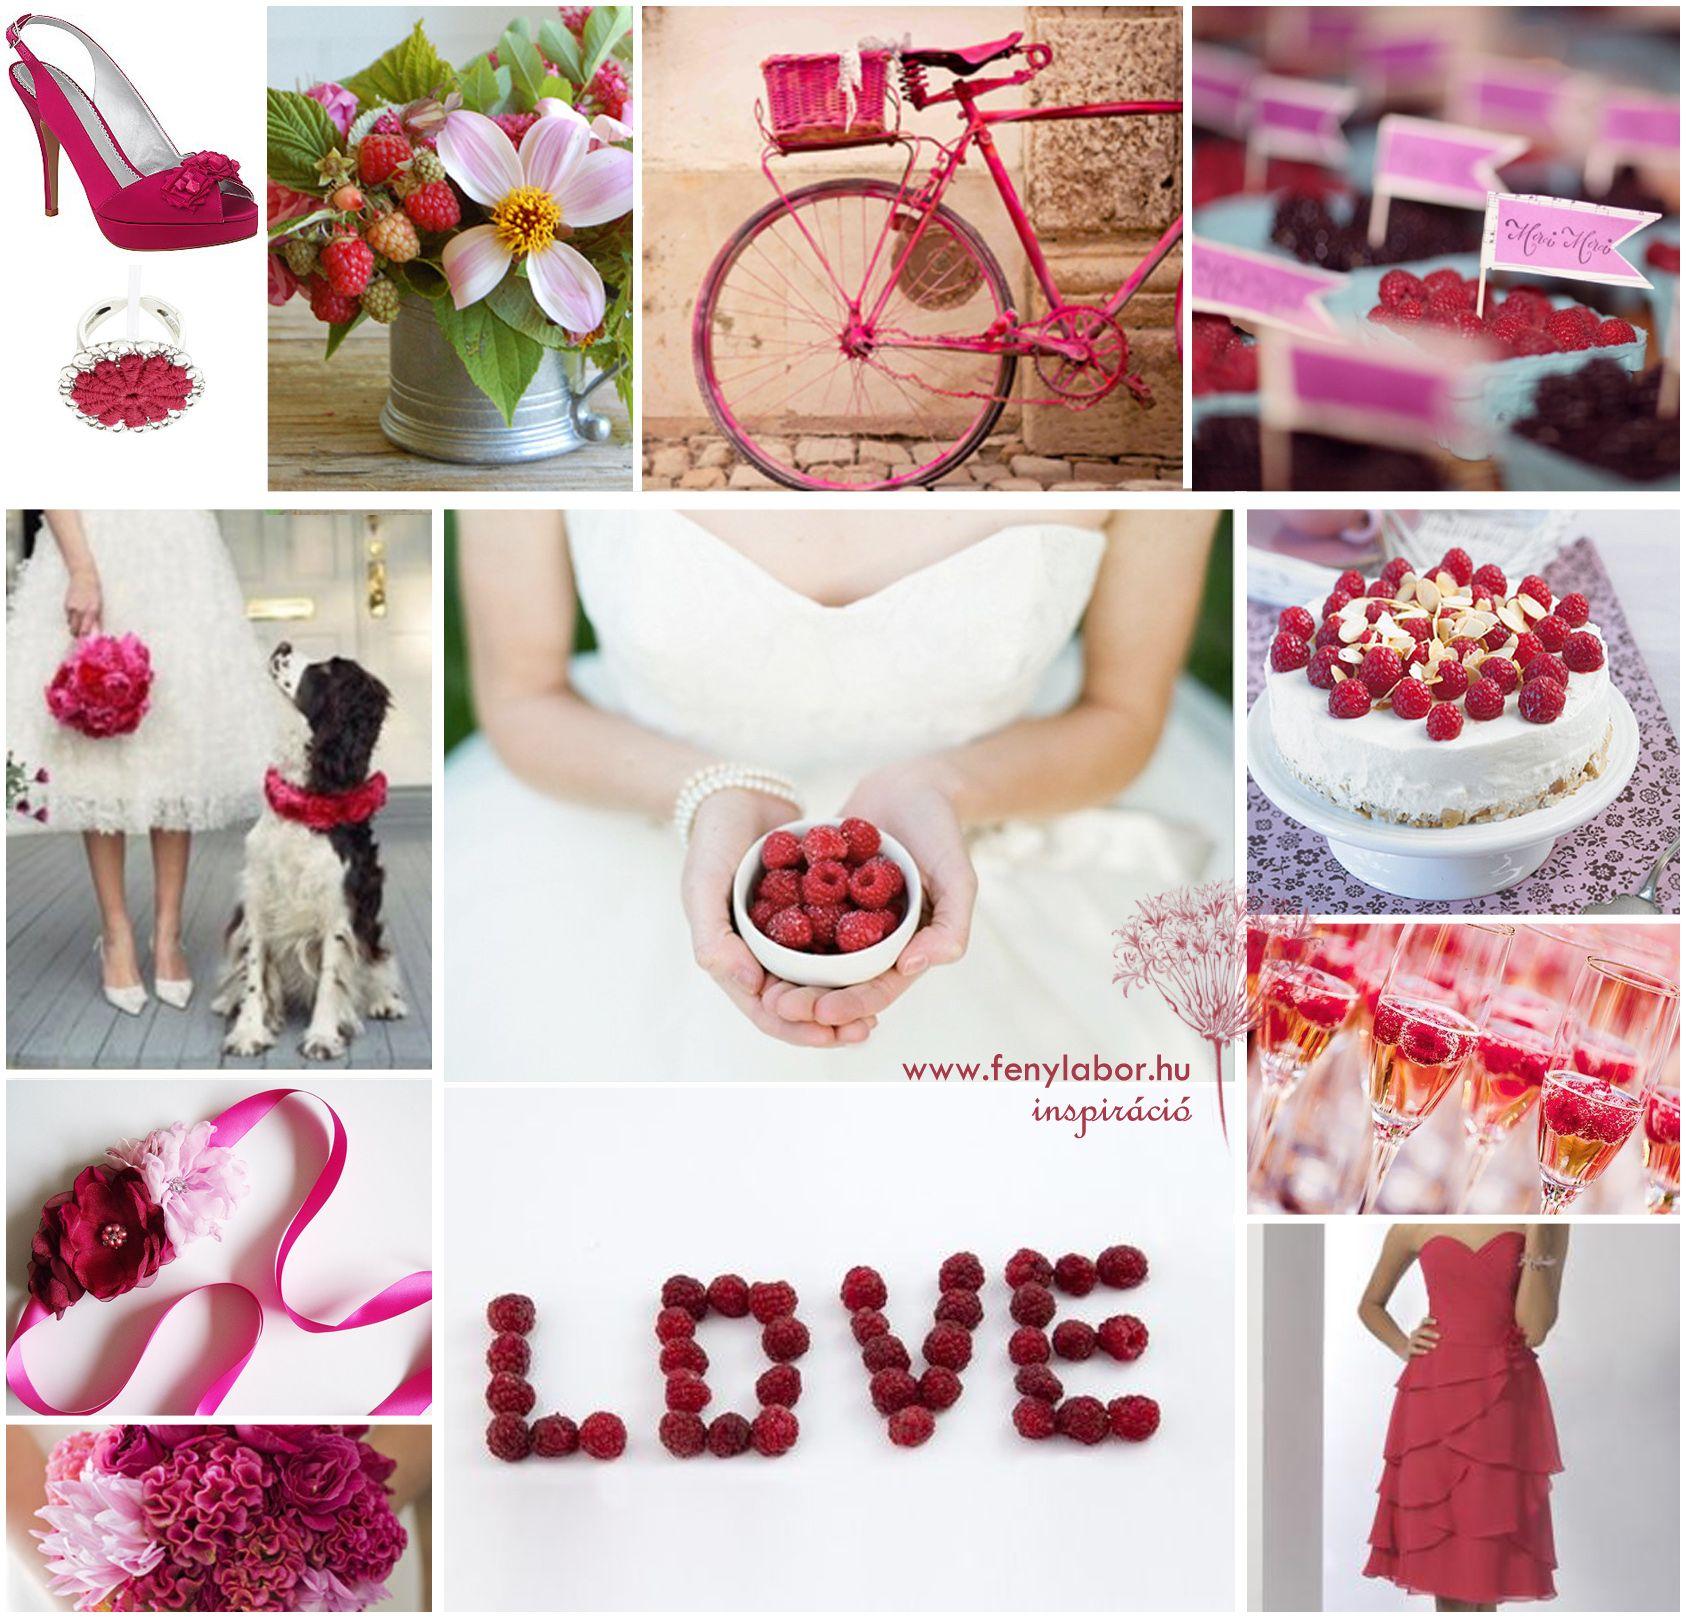 raspberry wedding inspiration | Wedding | Pinterest | Raspberry ...